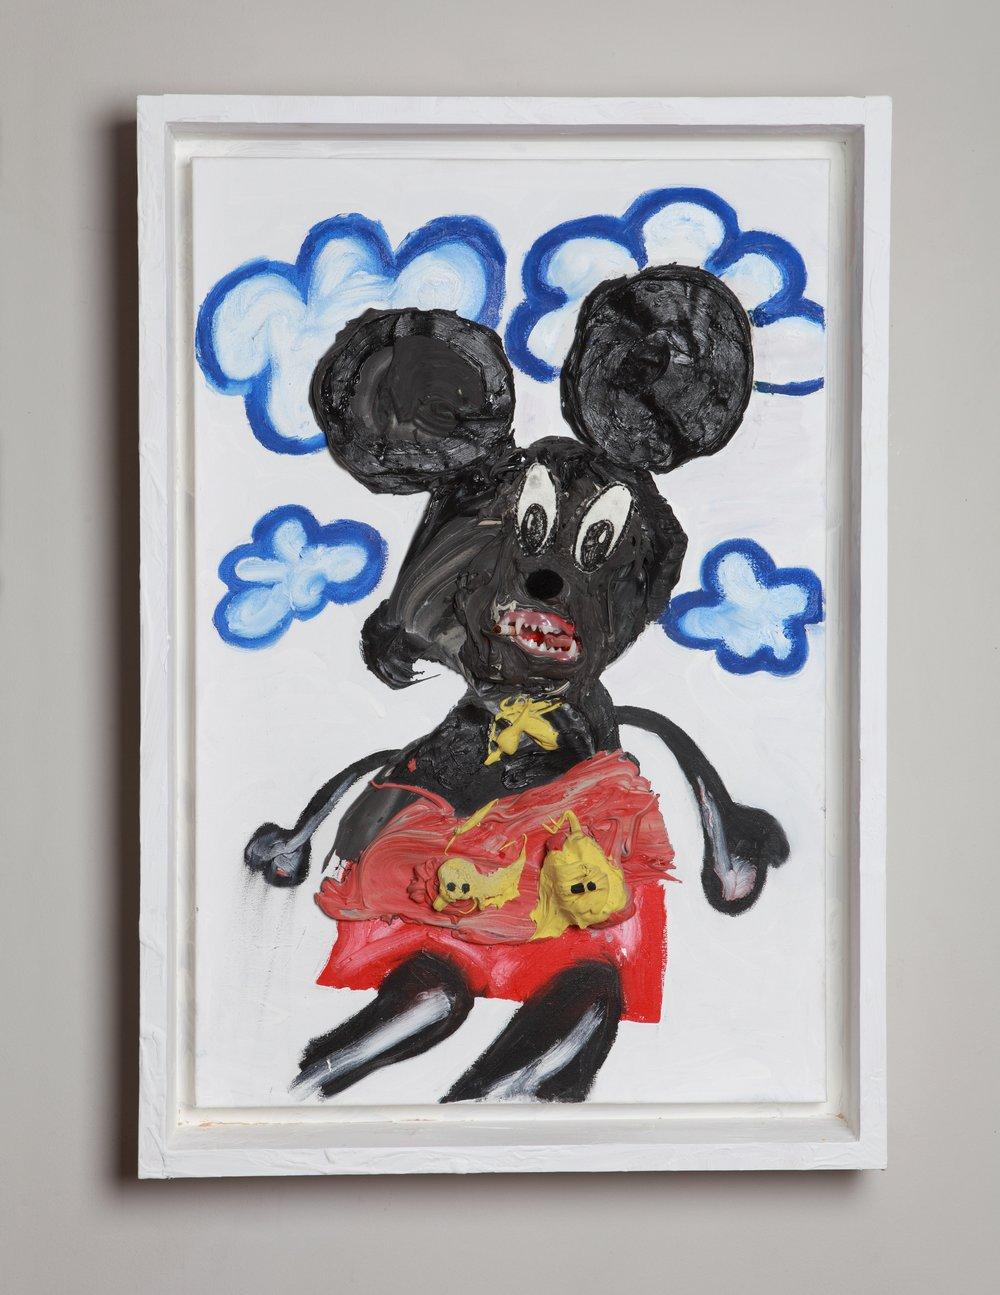 Mickey Mouth, 76.5 x 50.6 x 10 cm, 2019.